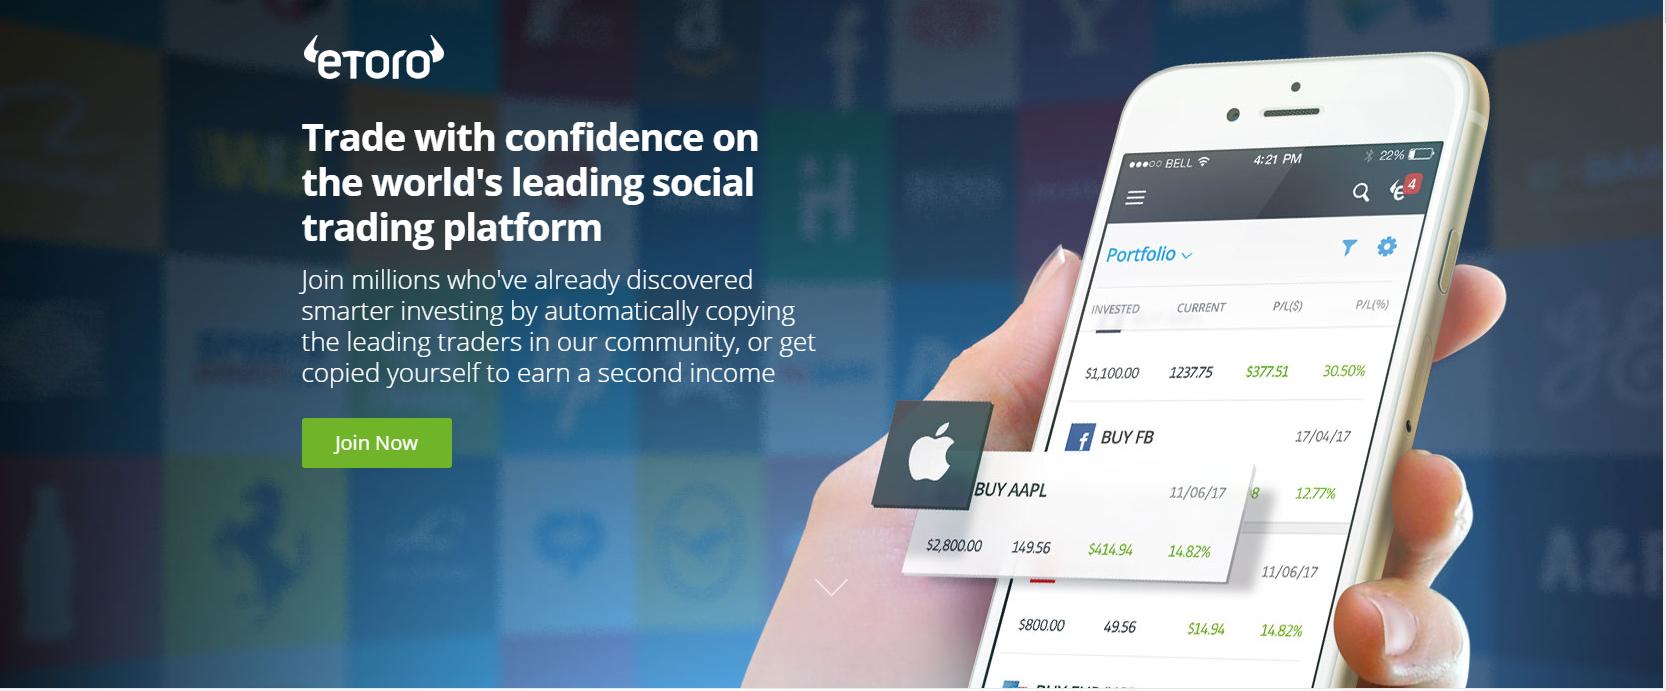 Social Trading Platform eToro